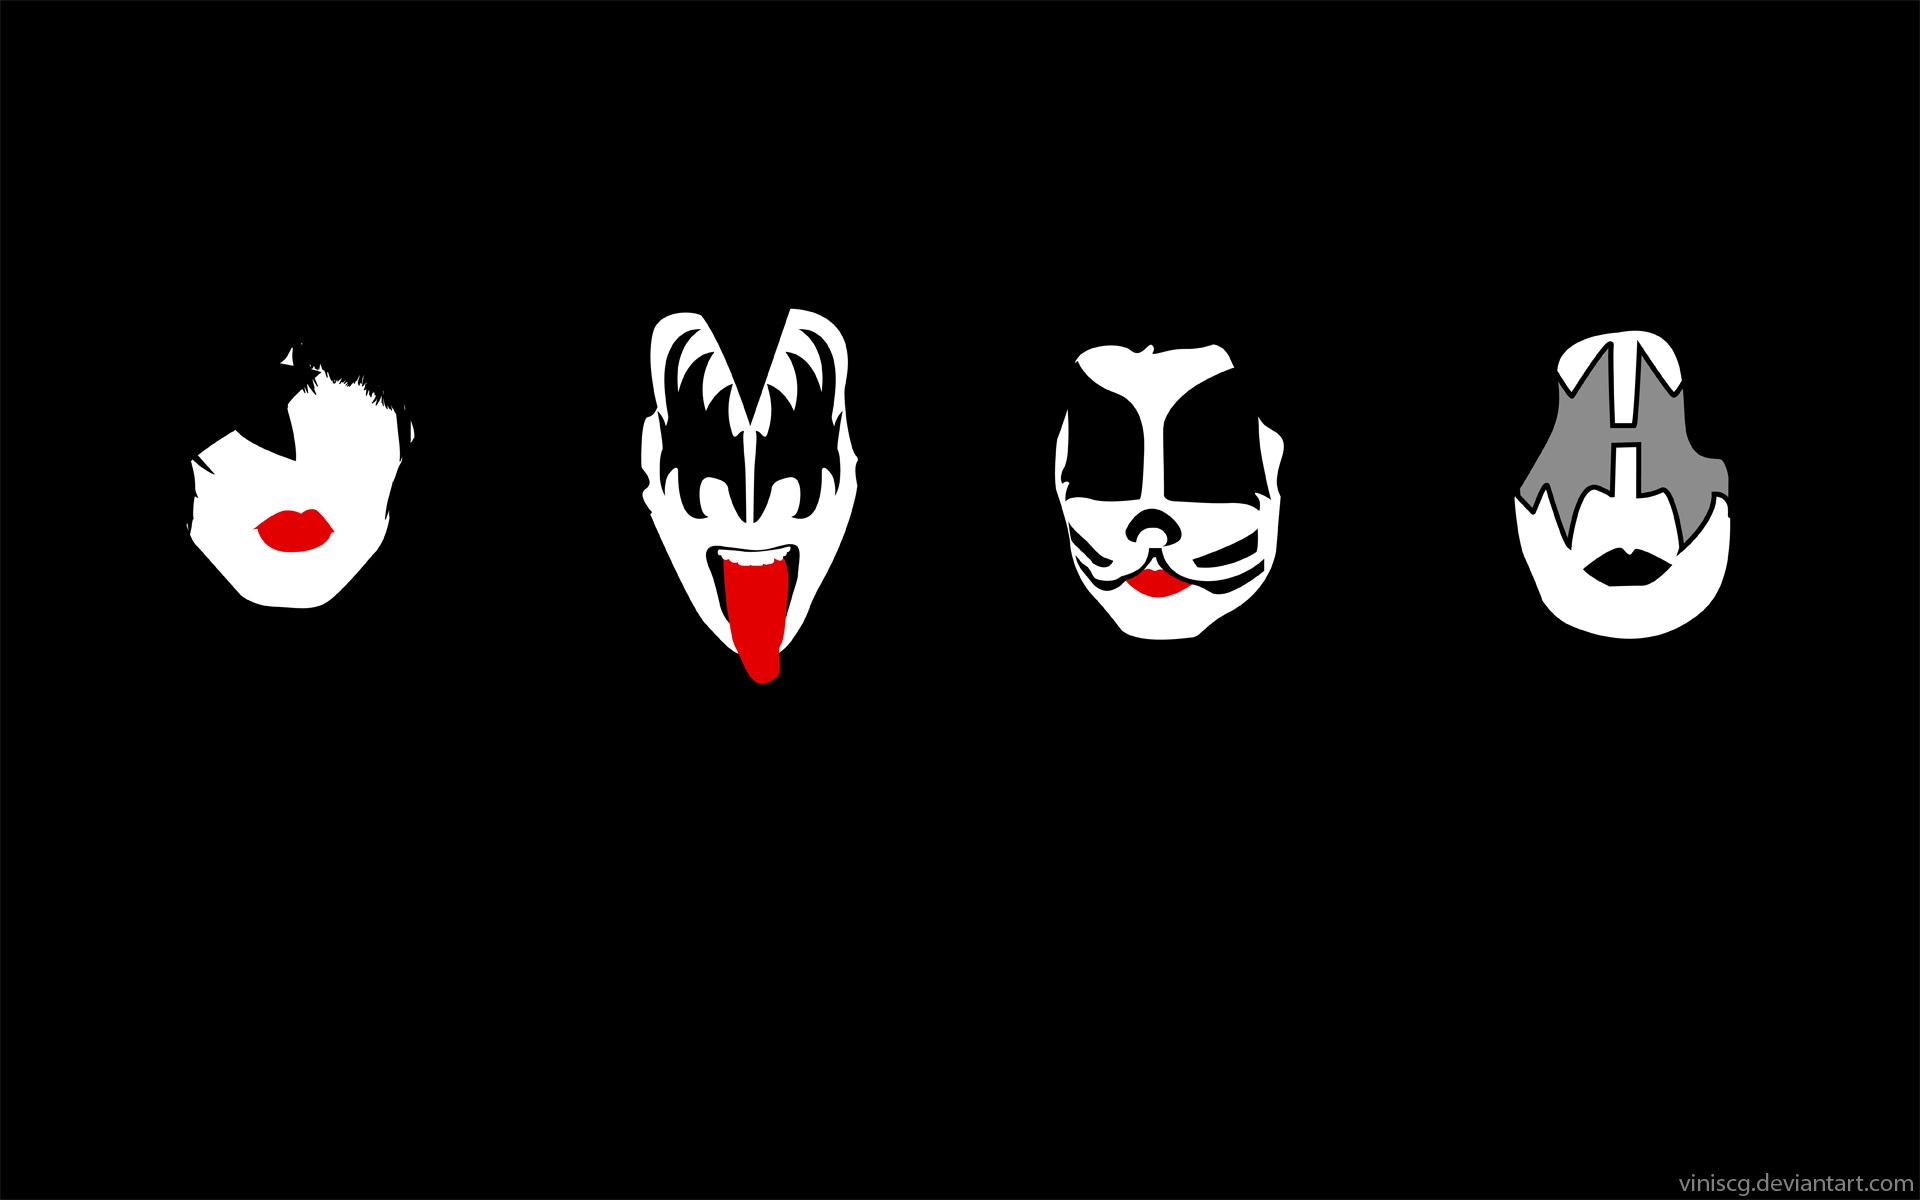 Kiss The Band Wallpaper  WallpaperSafari